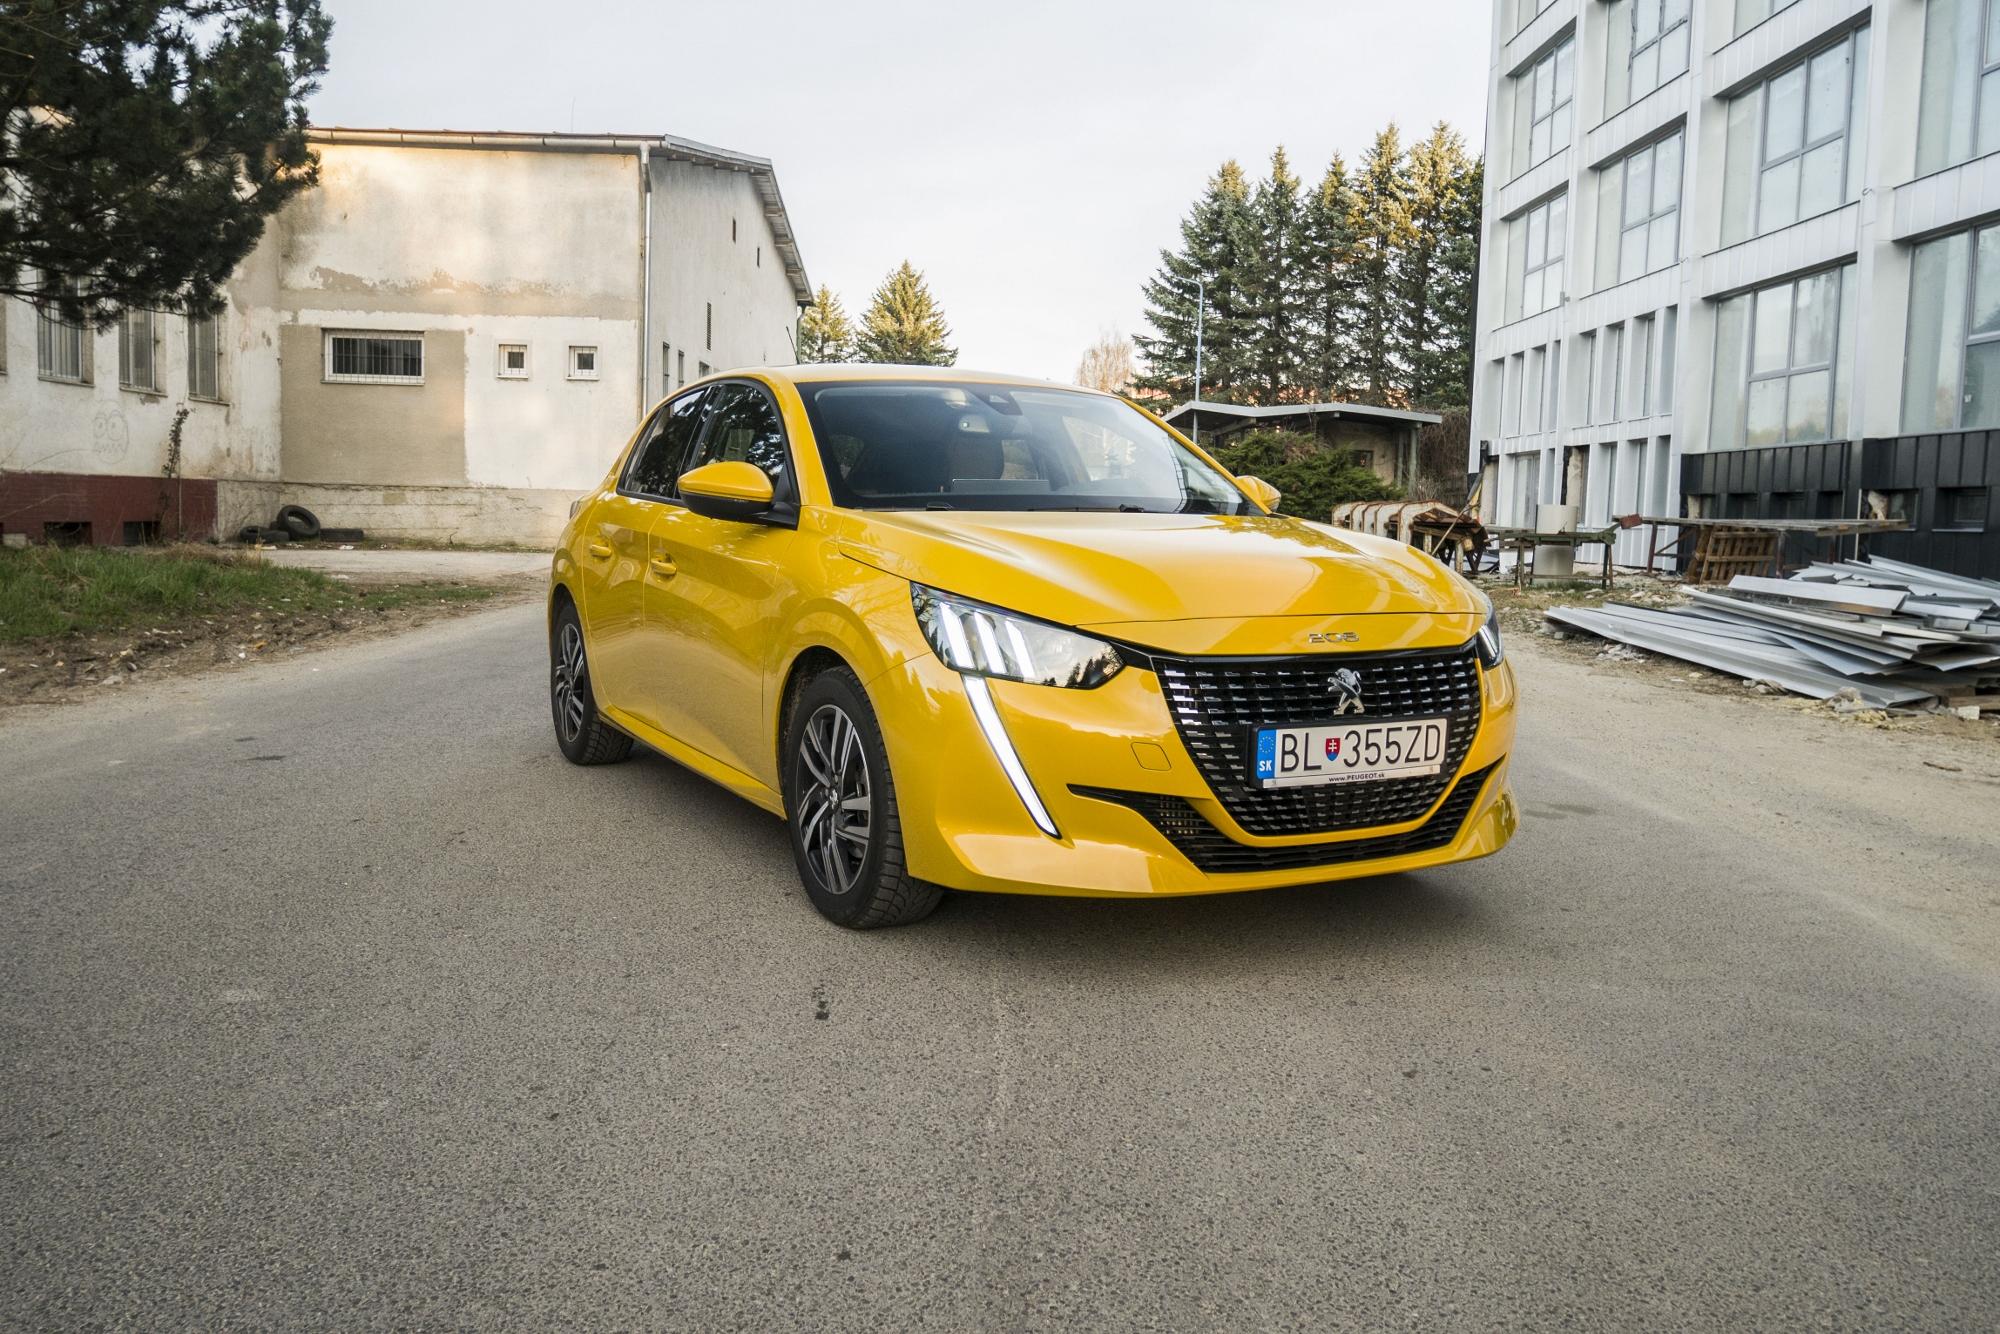 Test: Peugeot 208 prekvapivo pútal pohľady